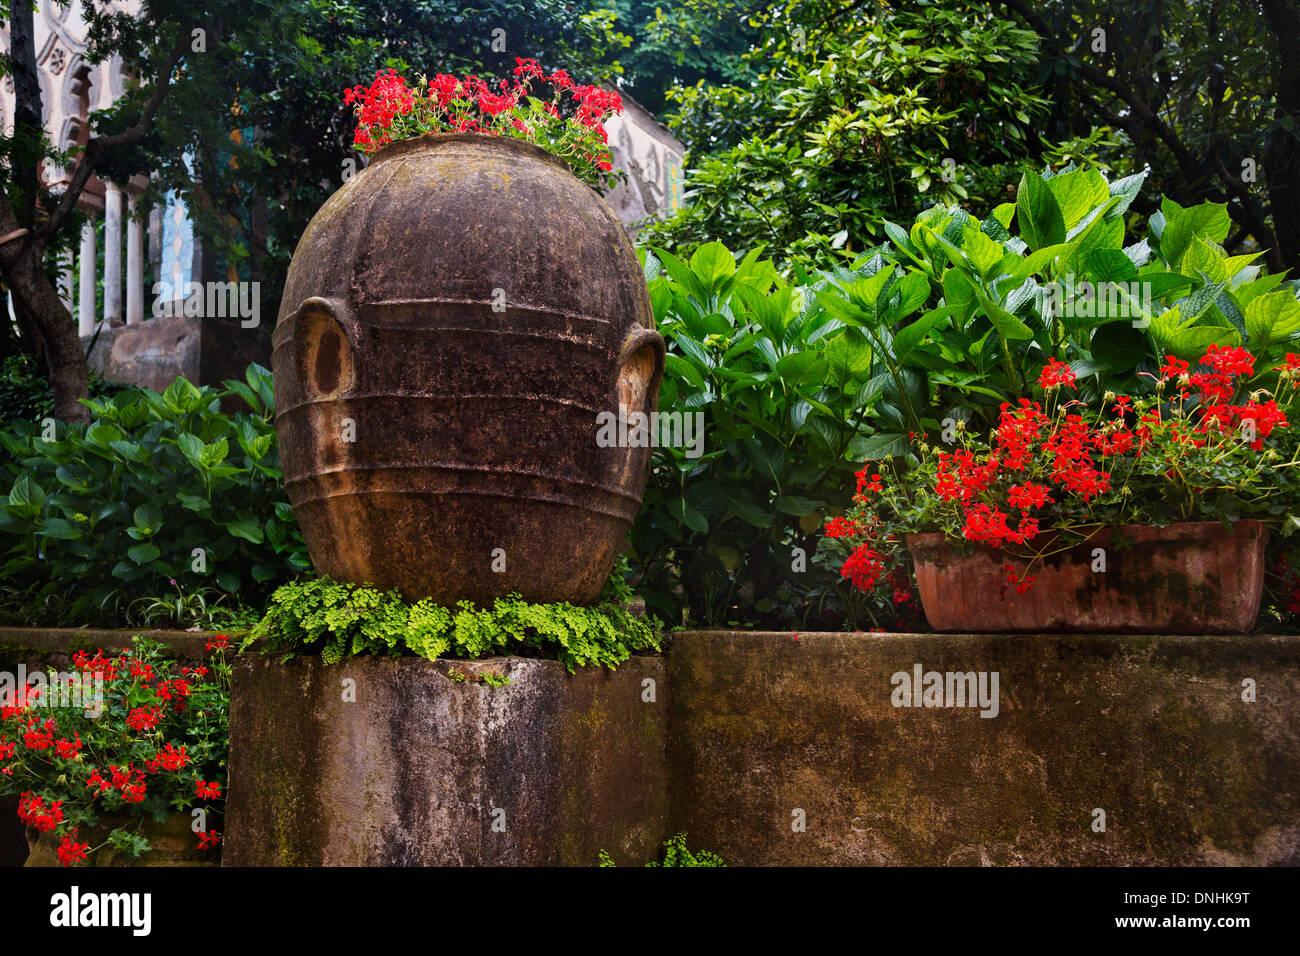 Pflanzen im Garten, Villa Cimbrone, Ravello, Provinz Salerno, Kampanien, Italien Stockfoto